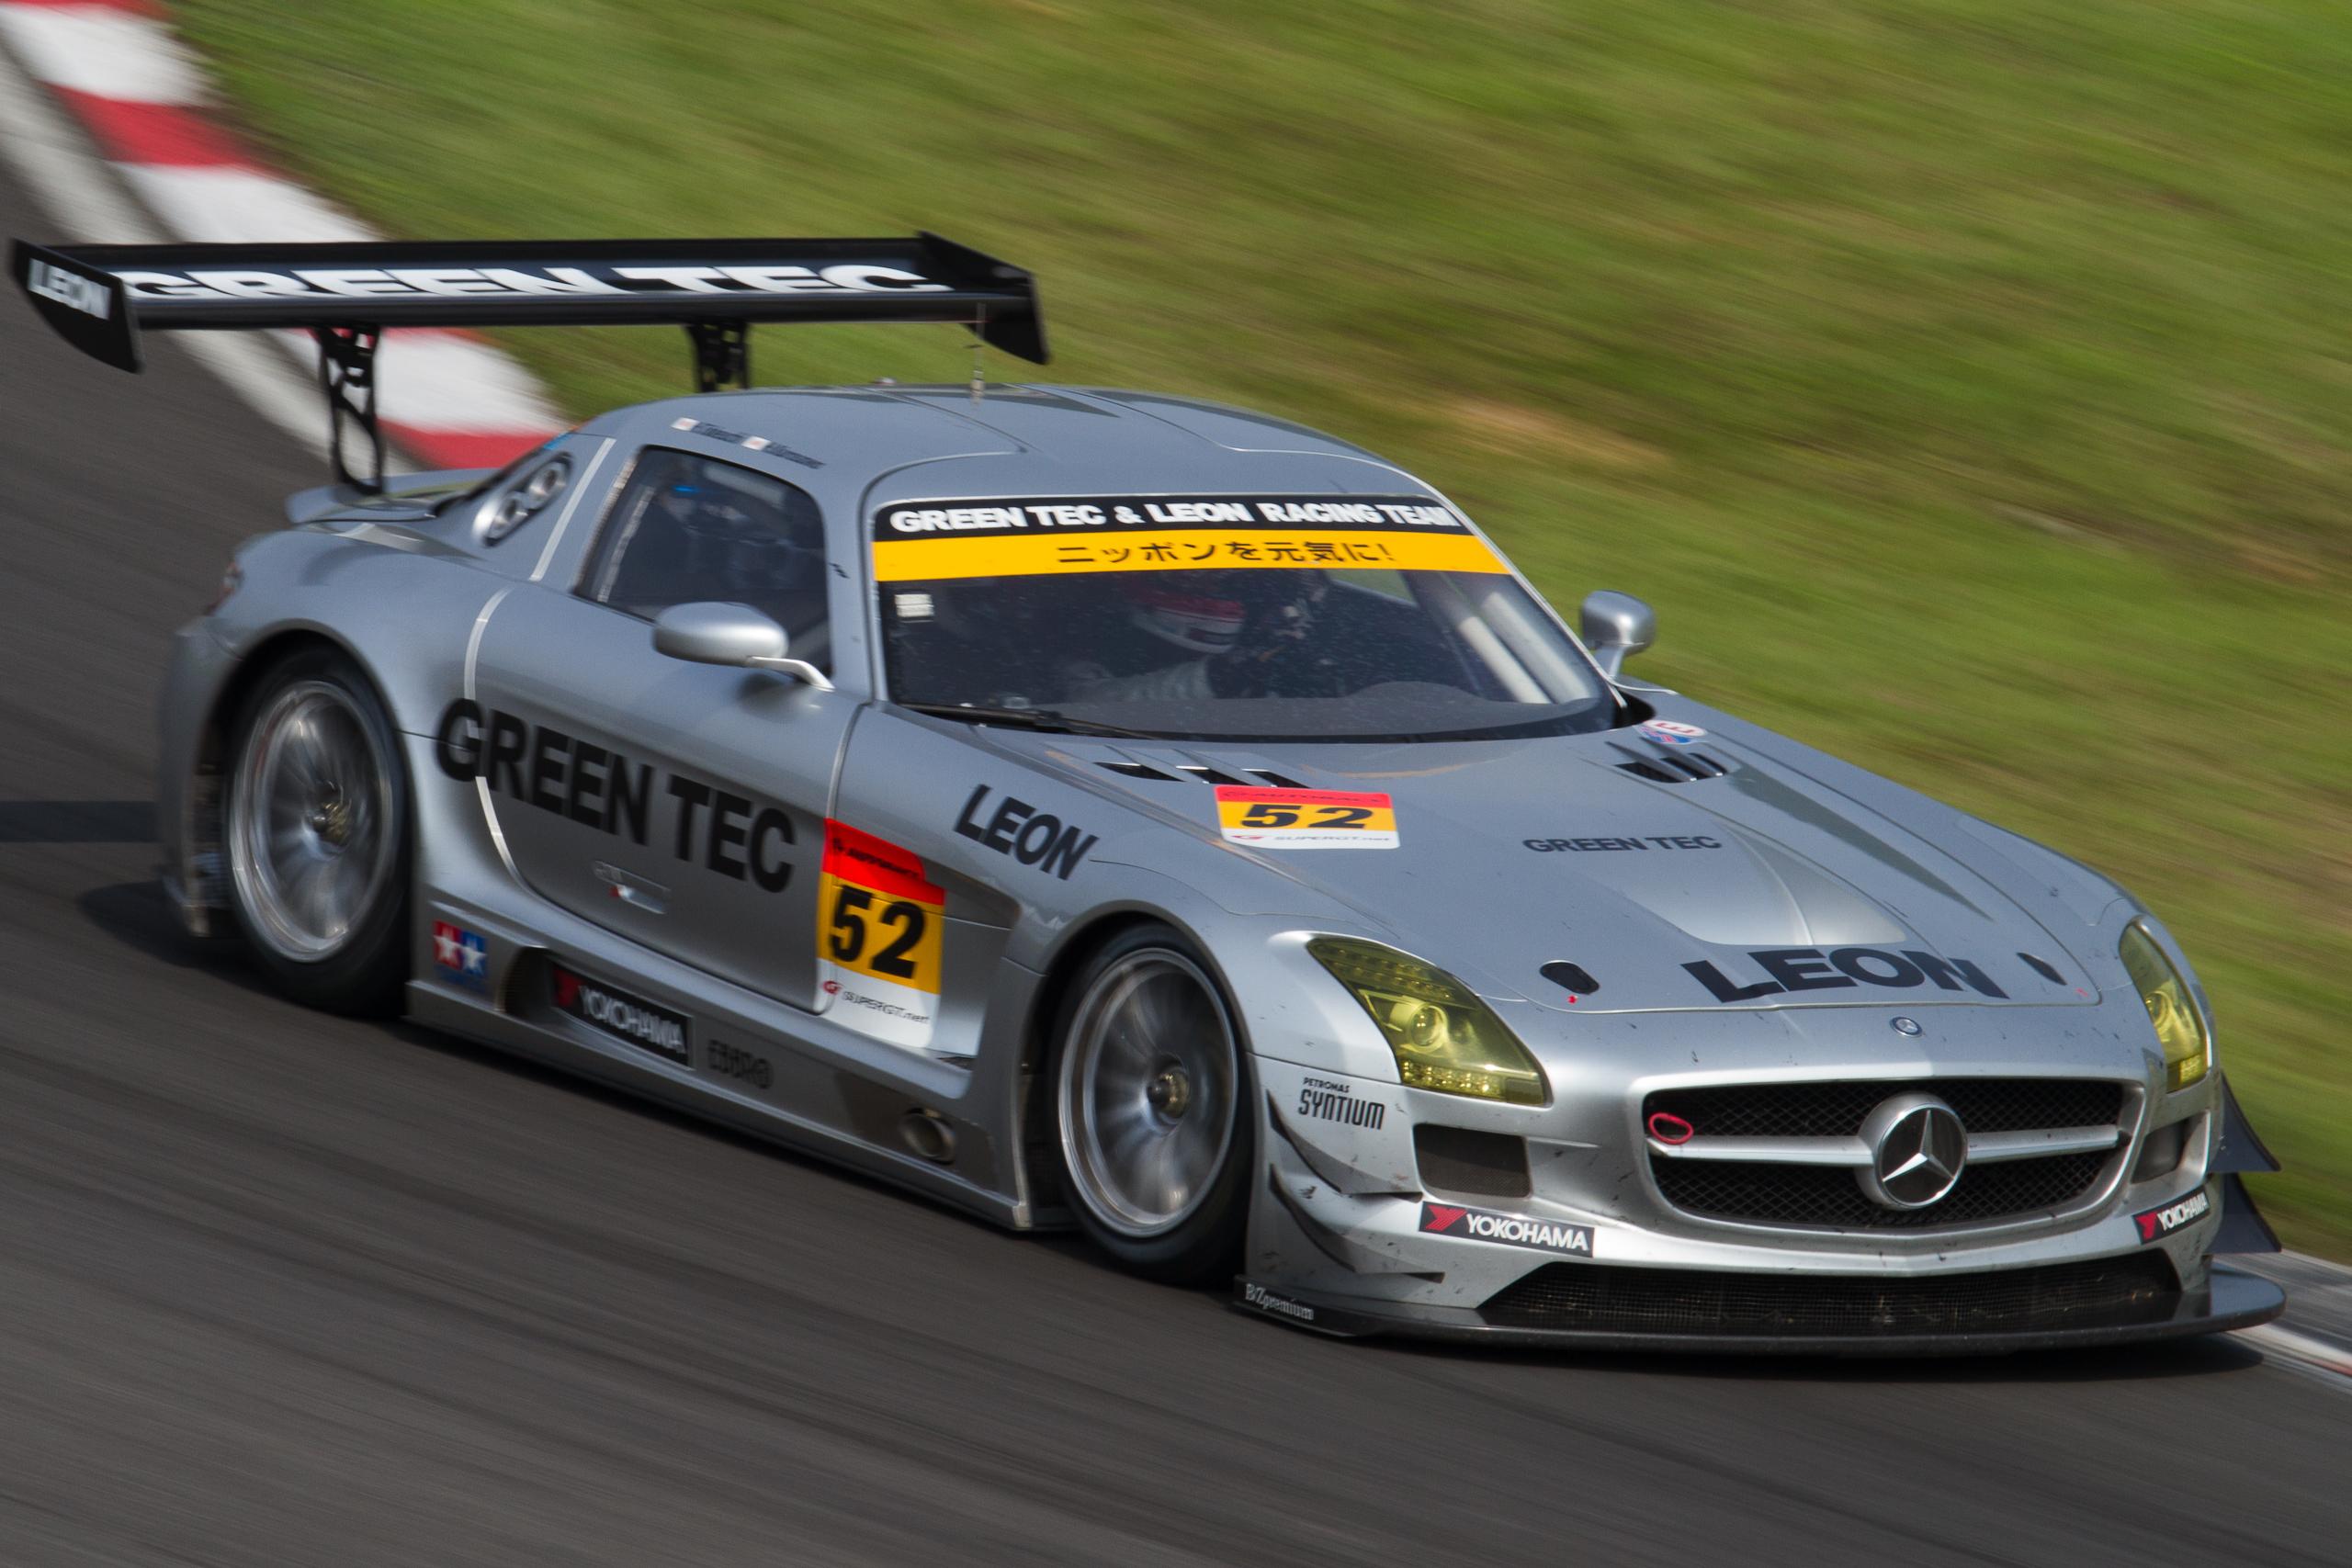 File Green Tec Leon Sls 2012 Super Gt Sugo Race Jpg